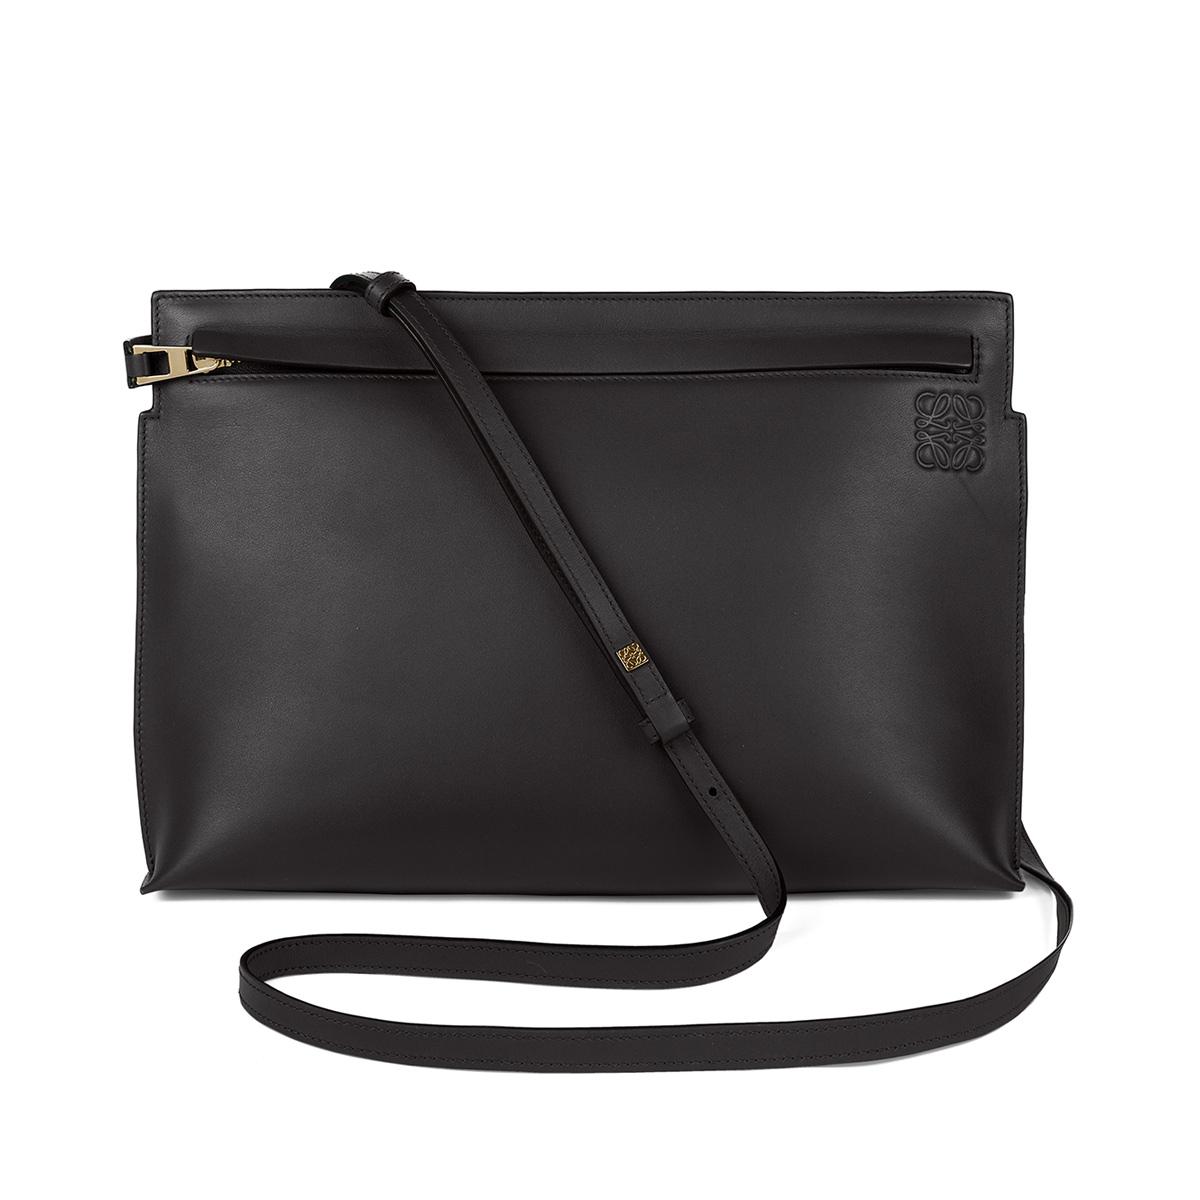 T Pouch Bag Black Loewe